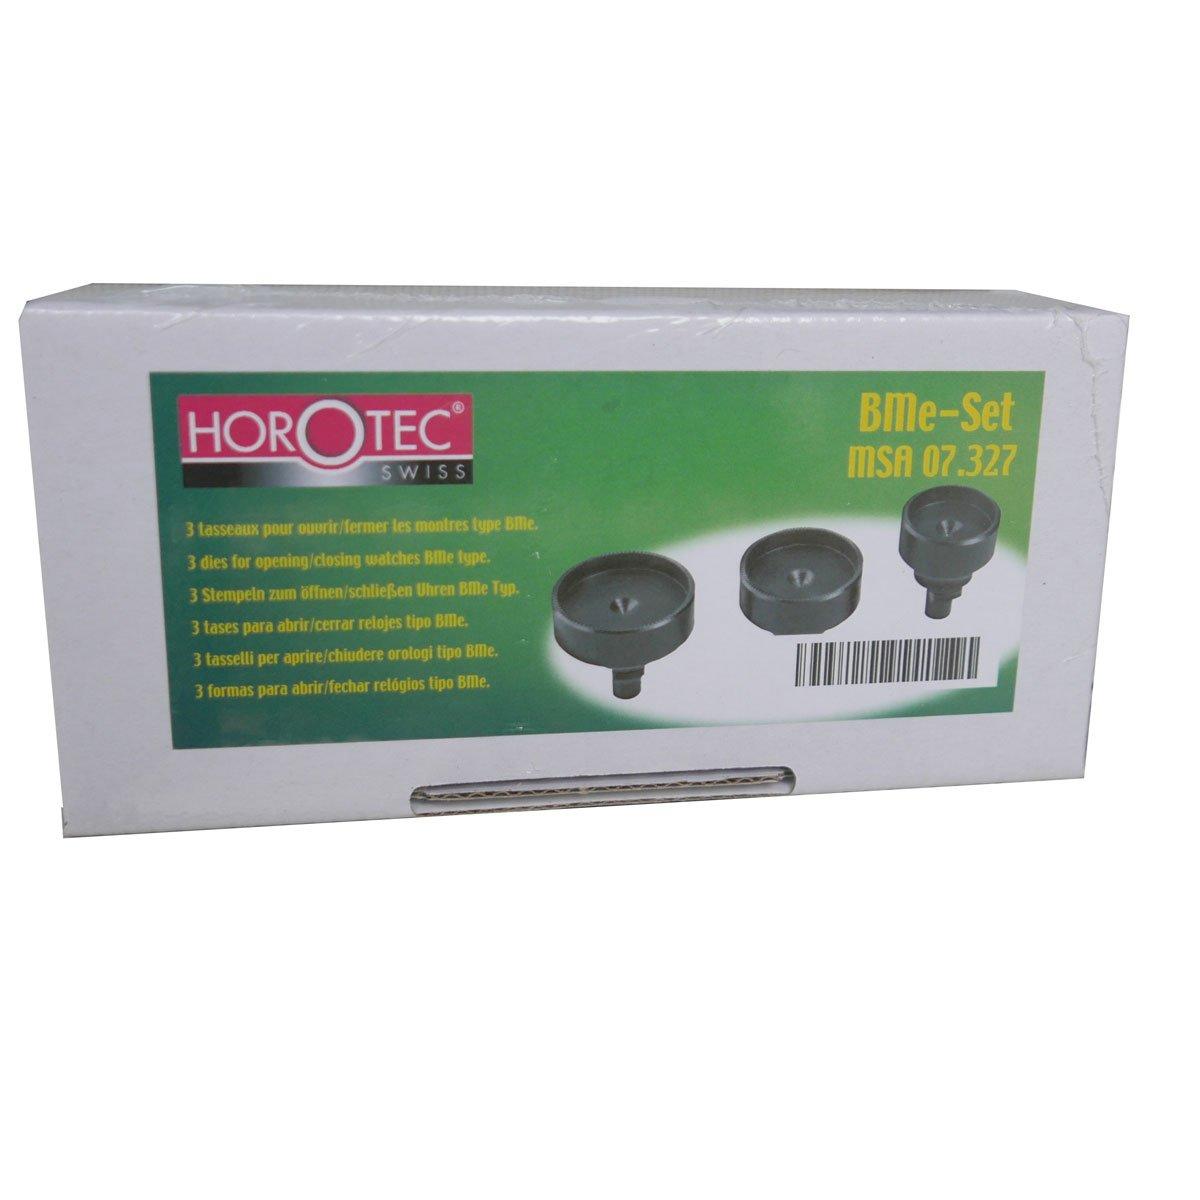 Horotec 3-Set Case Die Opener for Baume & Mercier MSA 07.327